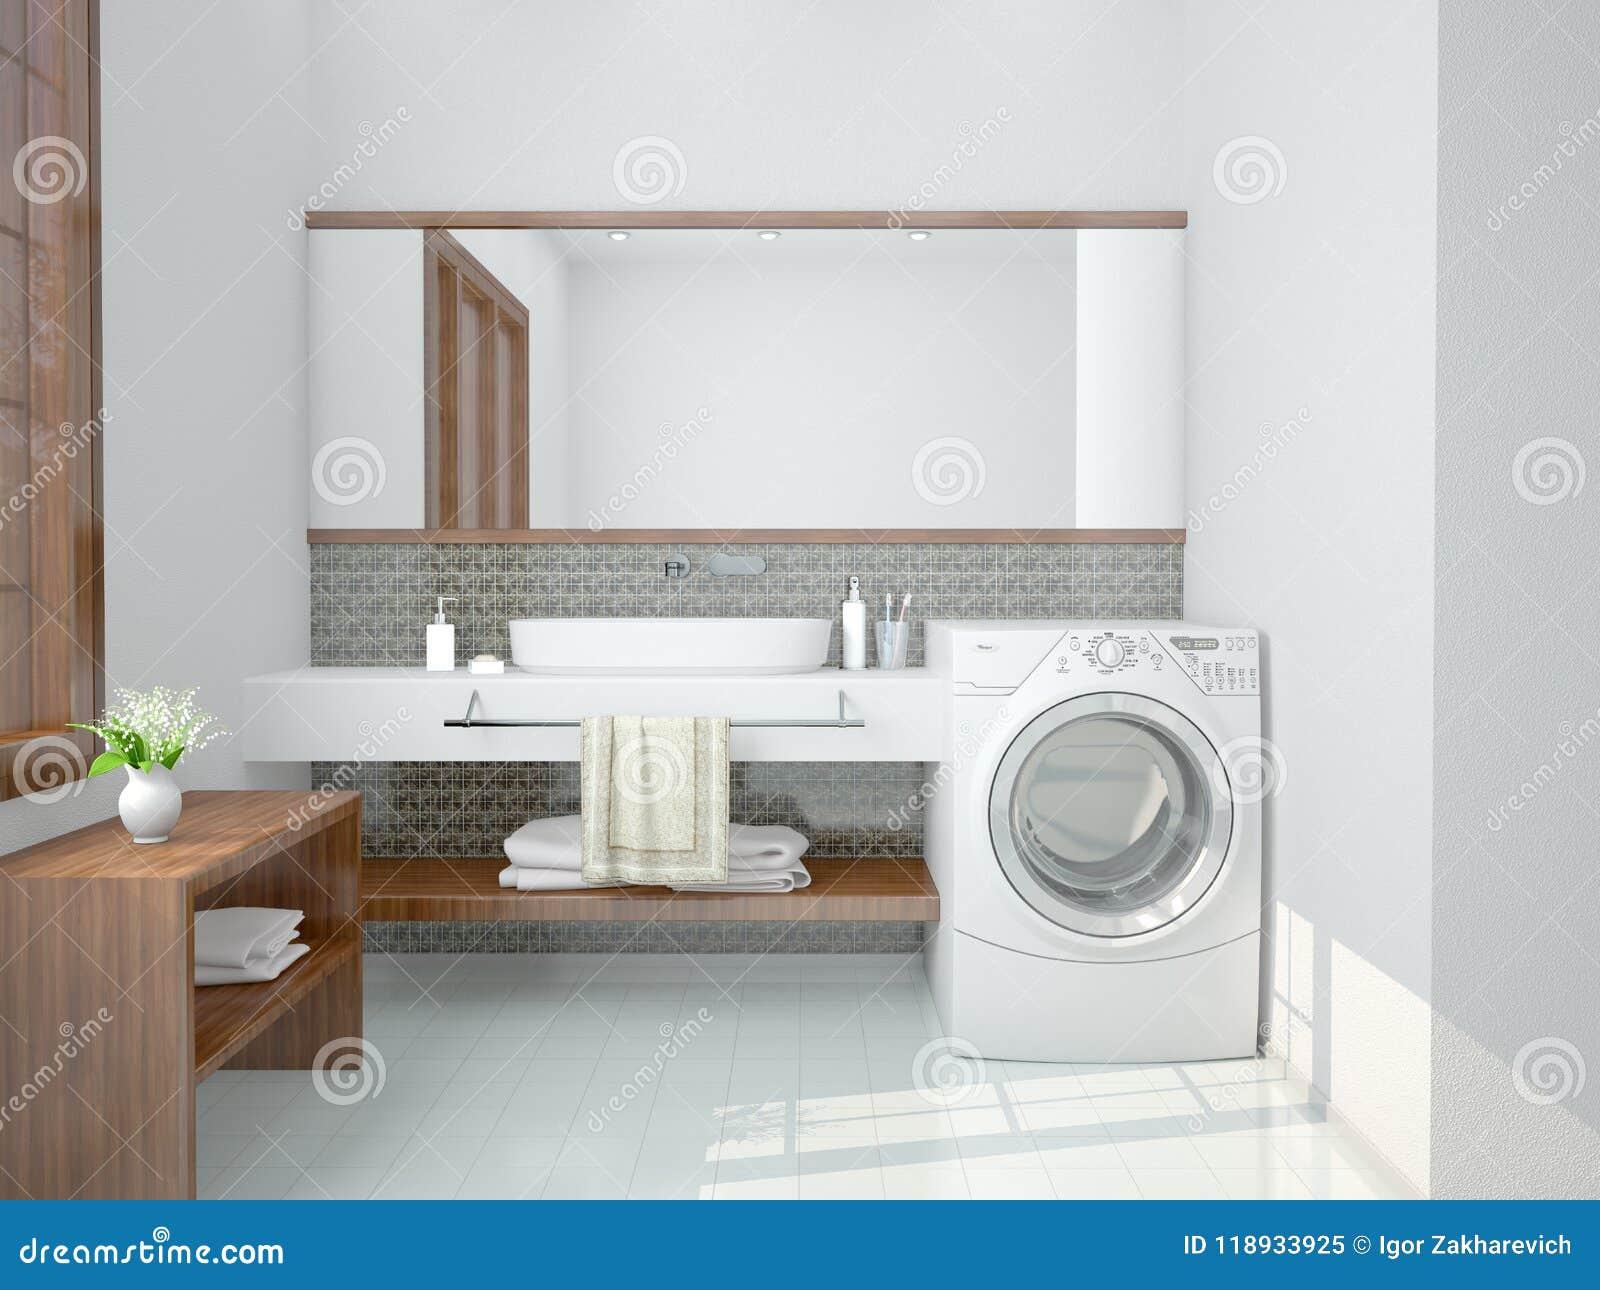 minimalist bathroom with a washing machine stock. Black Bedroom Furniture Sets. Home Design Ideas